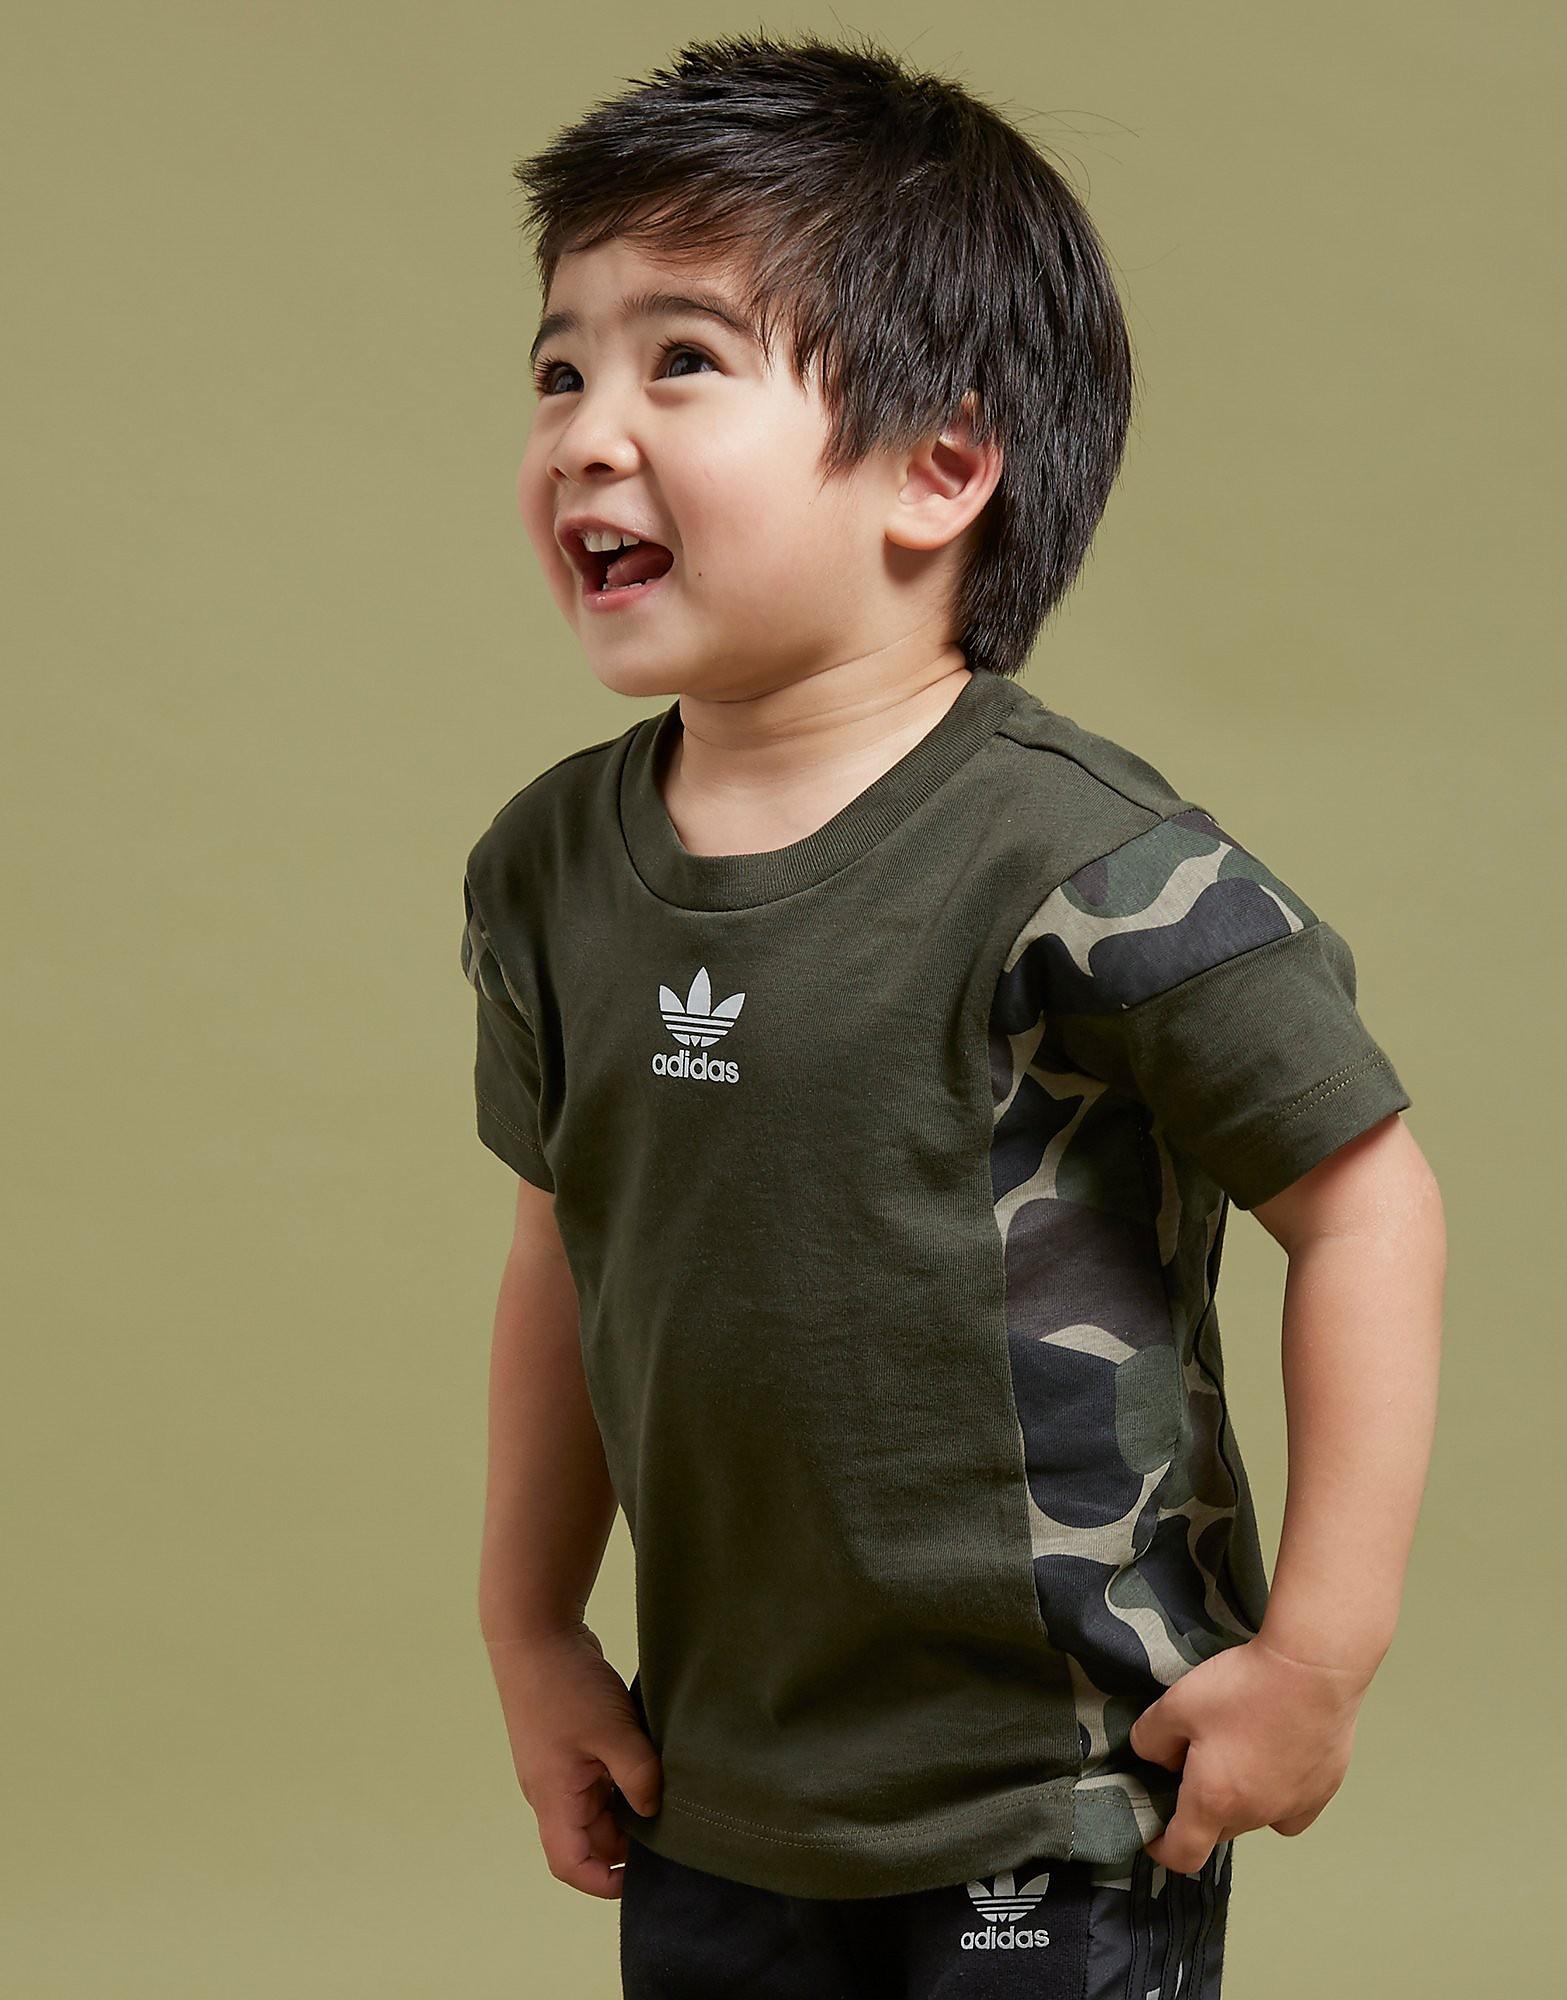 adidas Originals Europe T-Shirt Infant